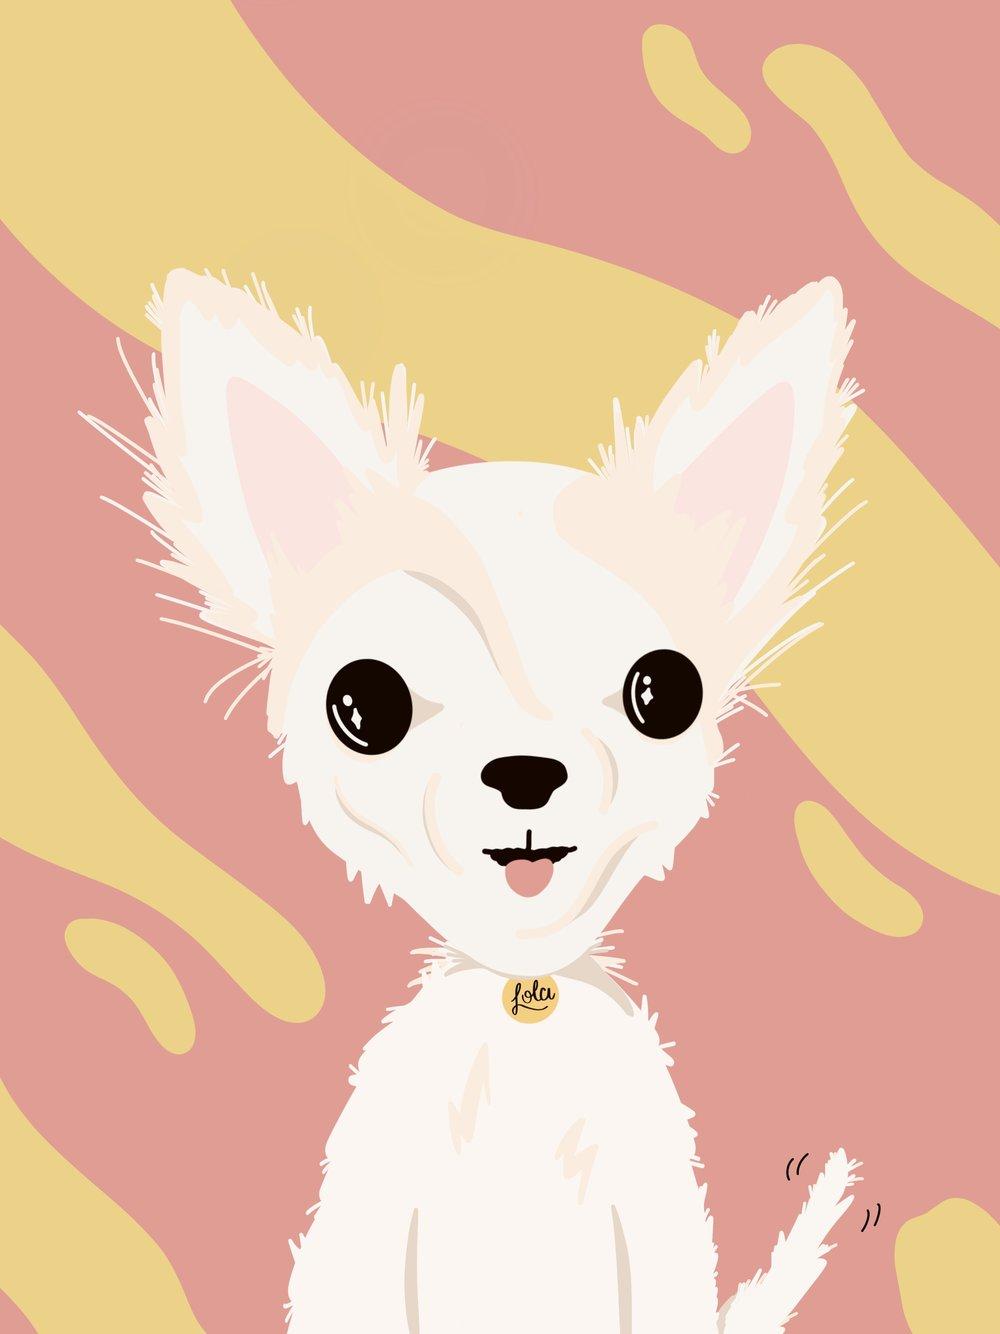 Lola-the-dog.jpg